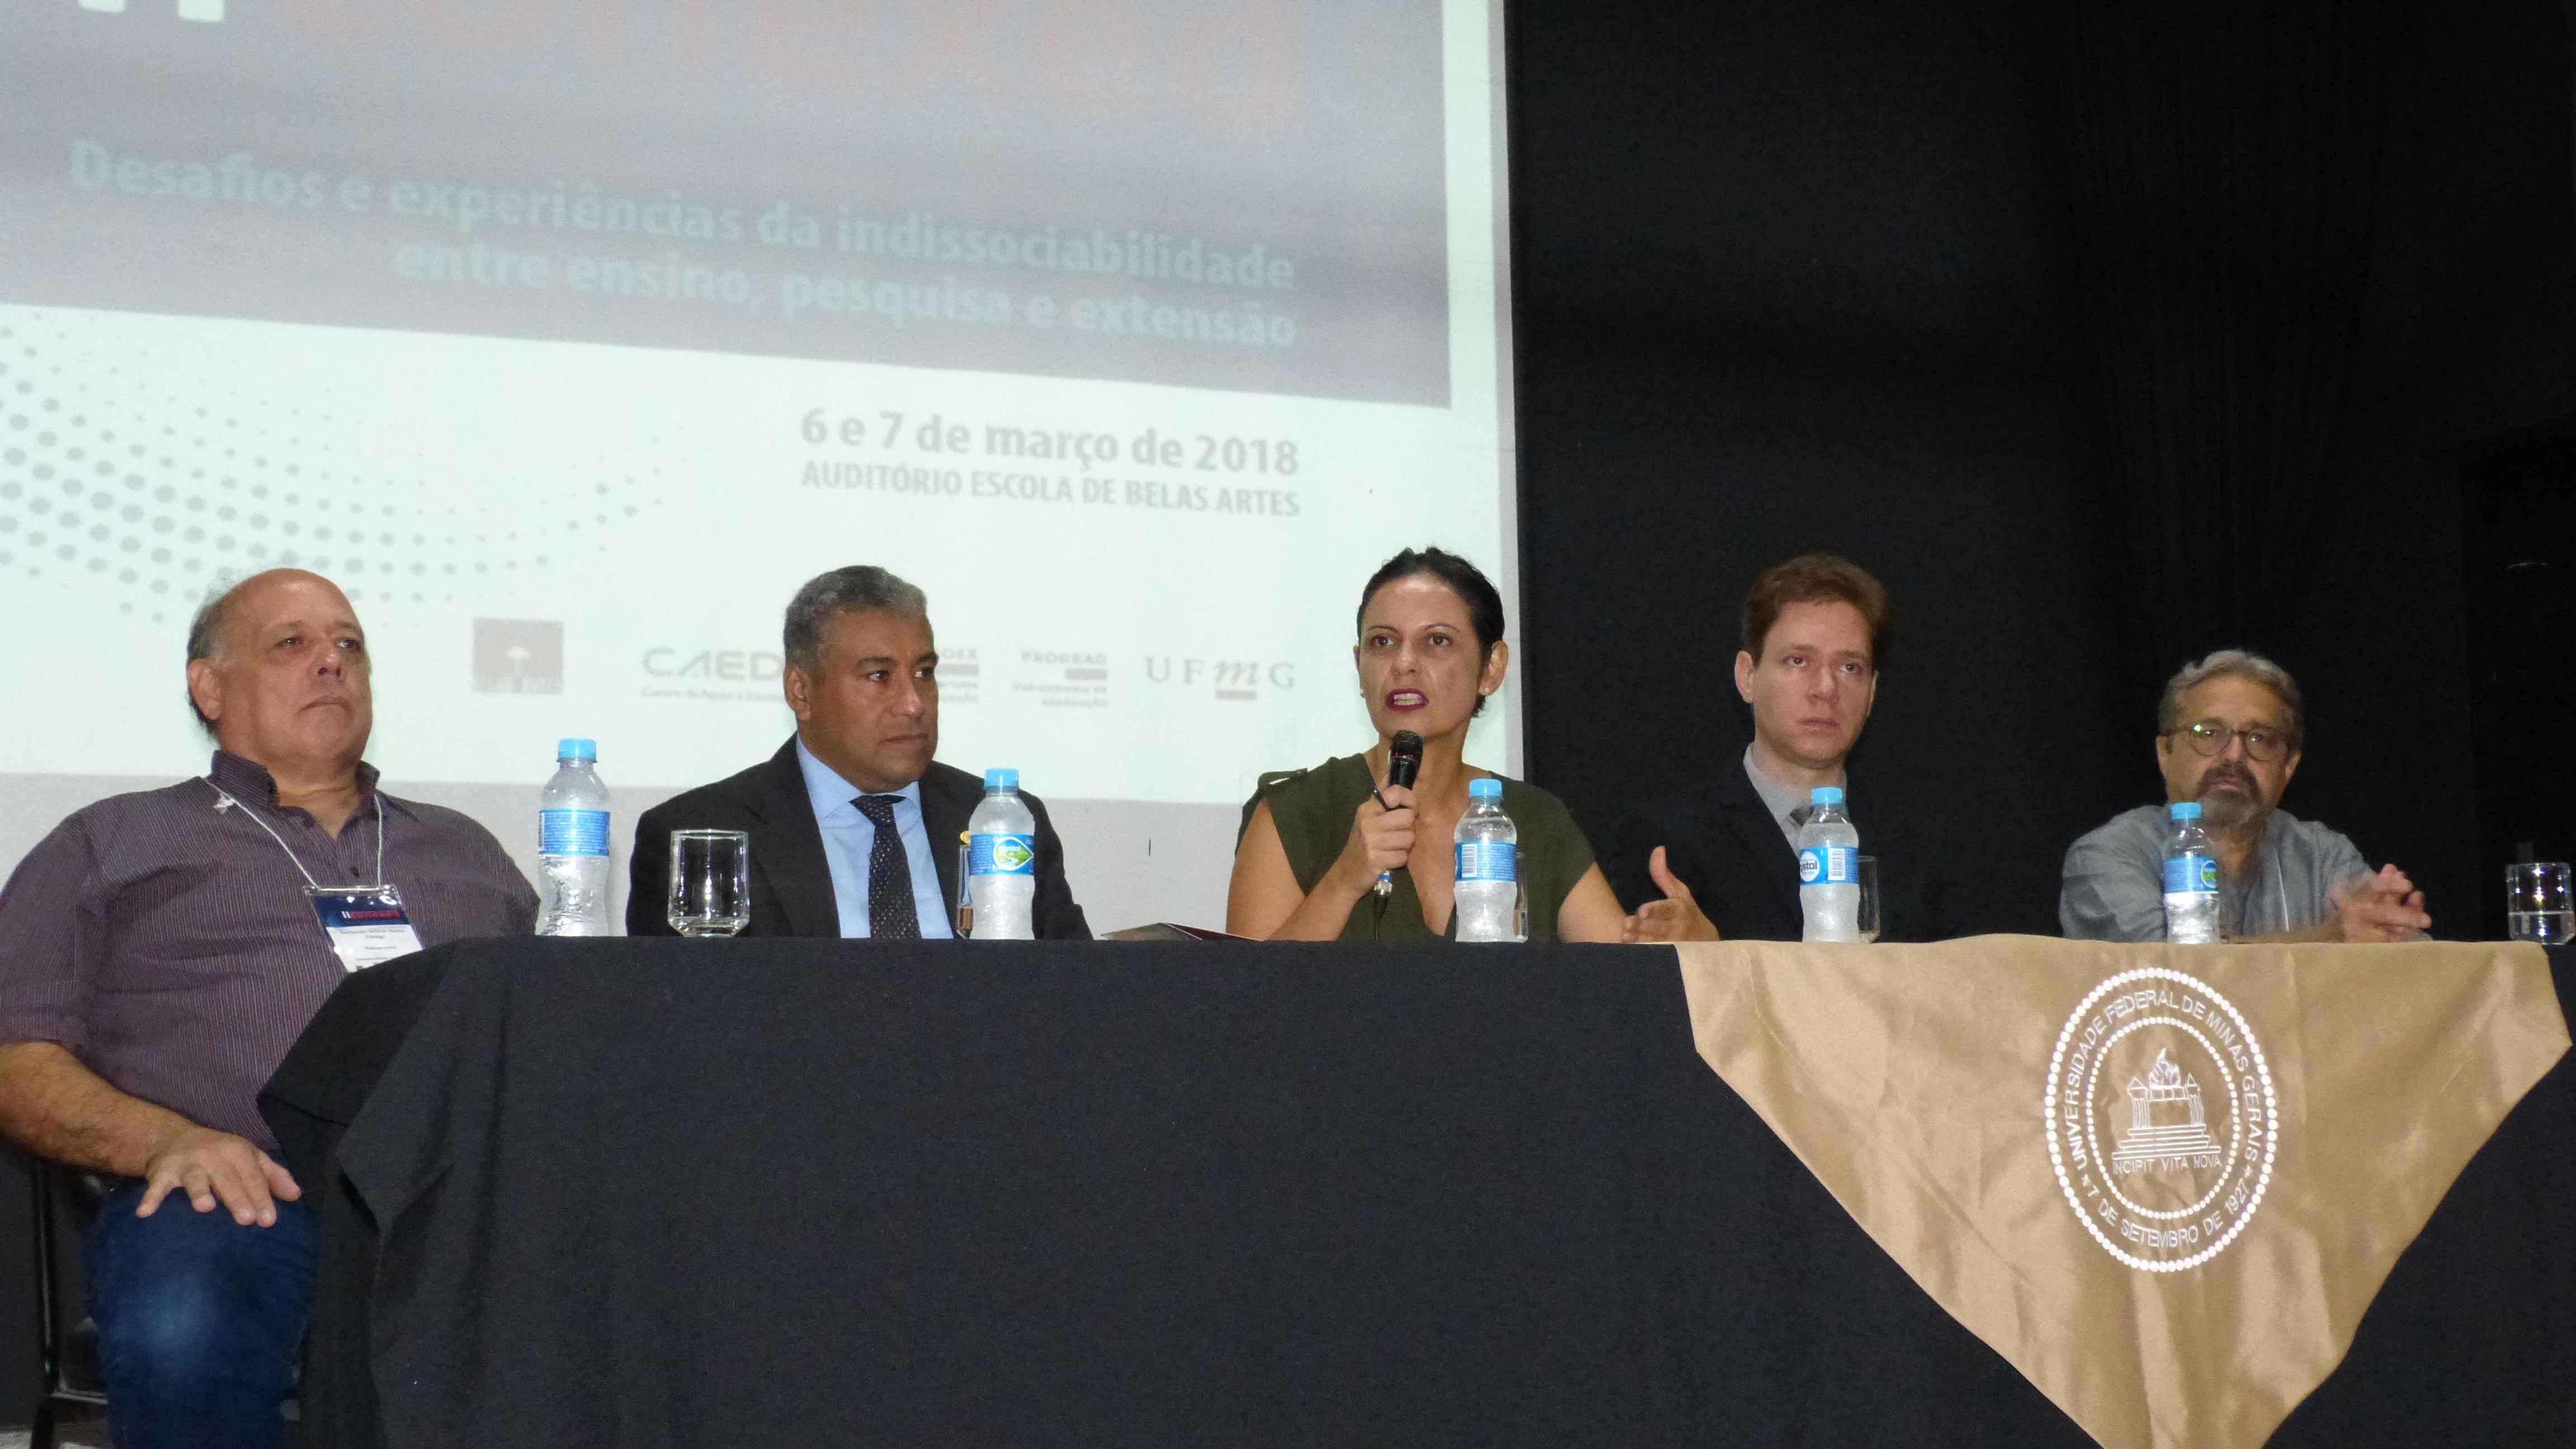 Fernando Fidalgo, Wagner Corradi, Cláudia Mayorga, Cristiano Bickel e Evandro Lemos durante a abertura do evento